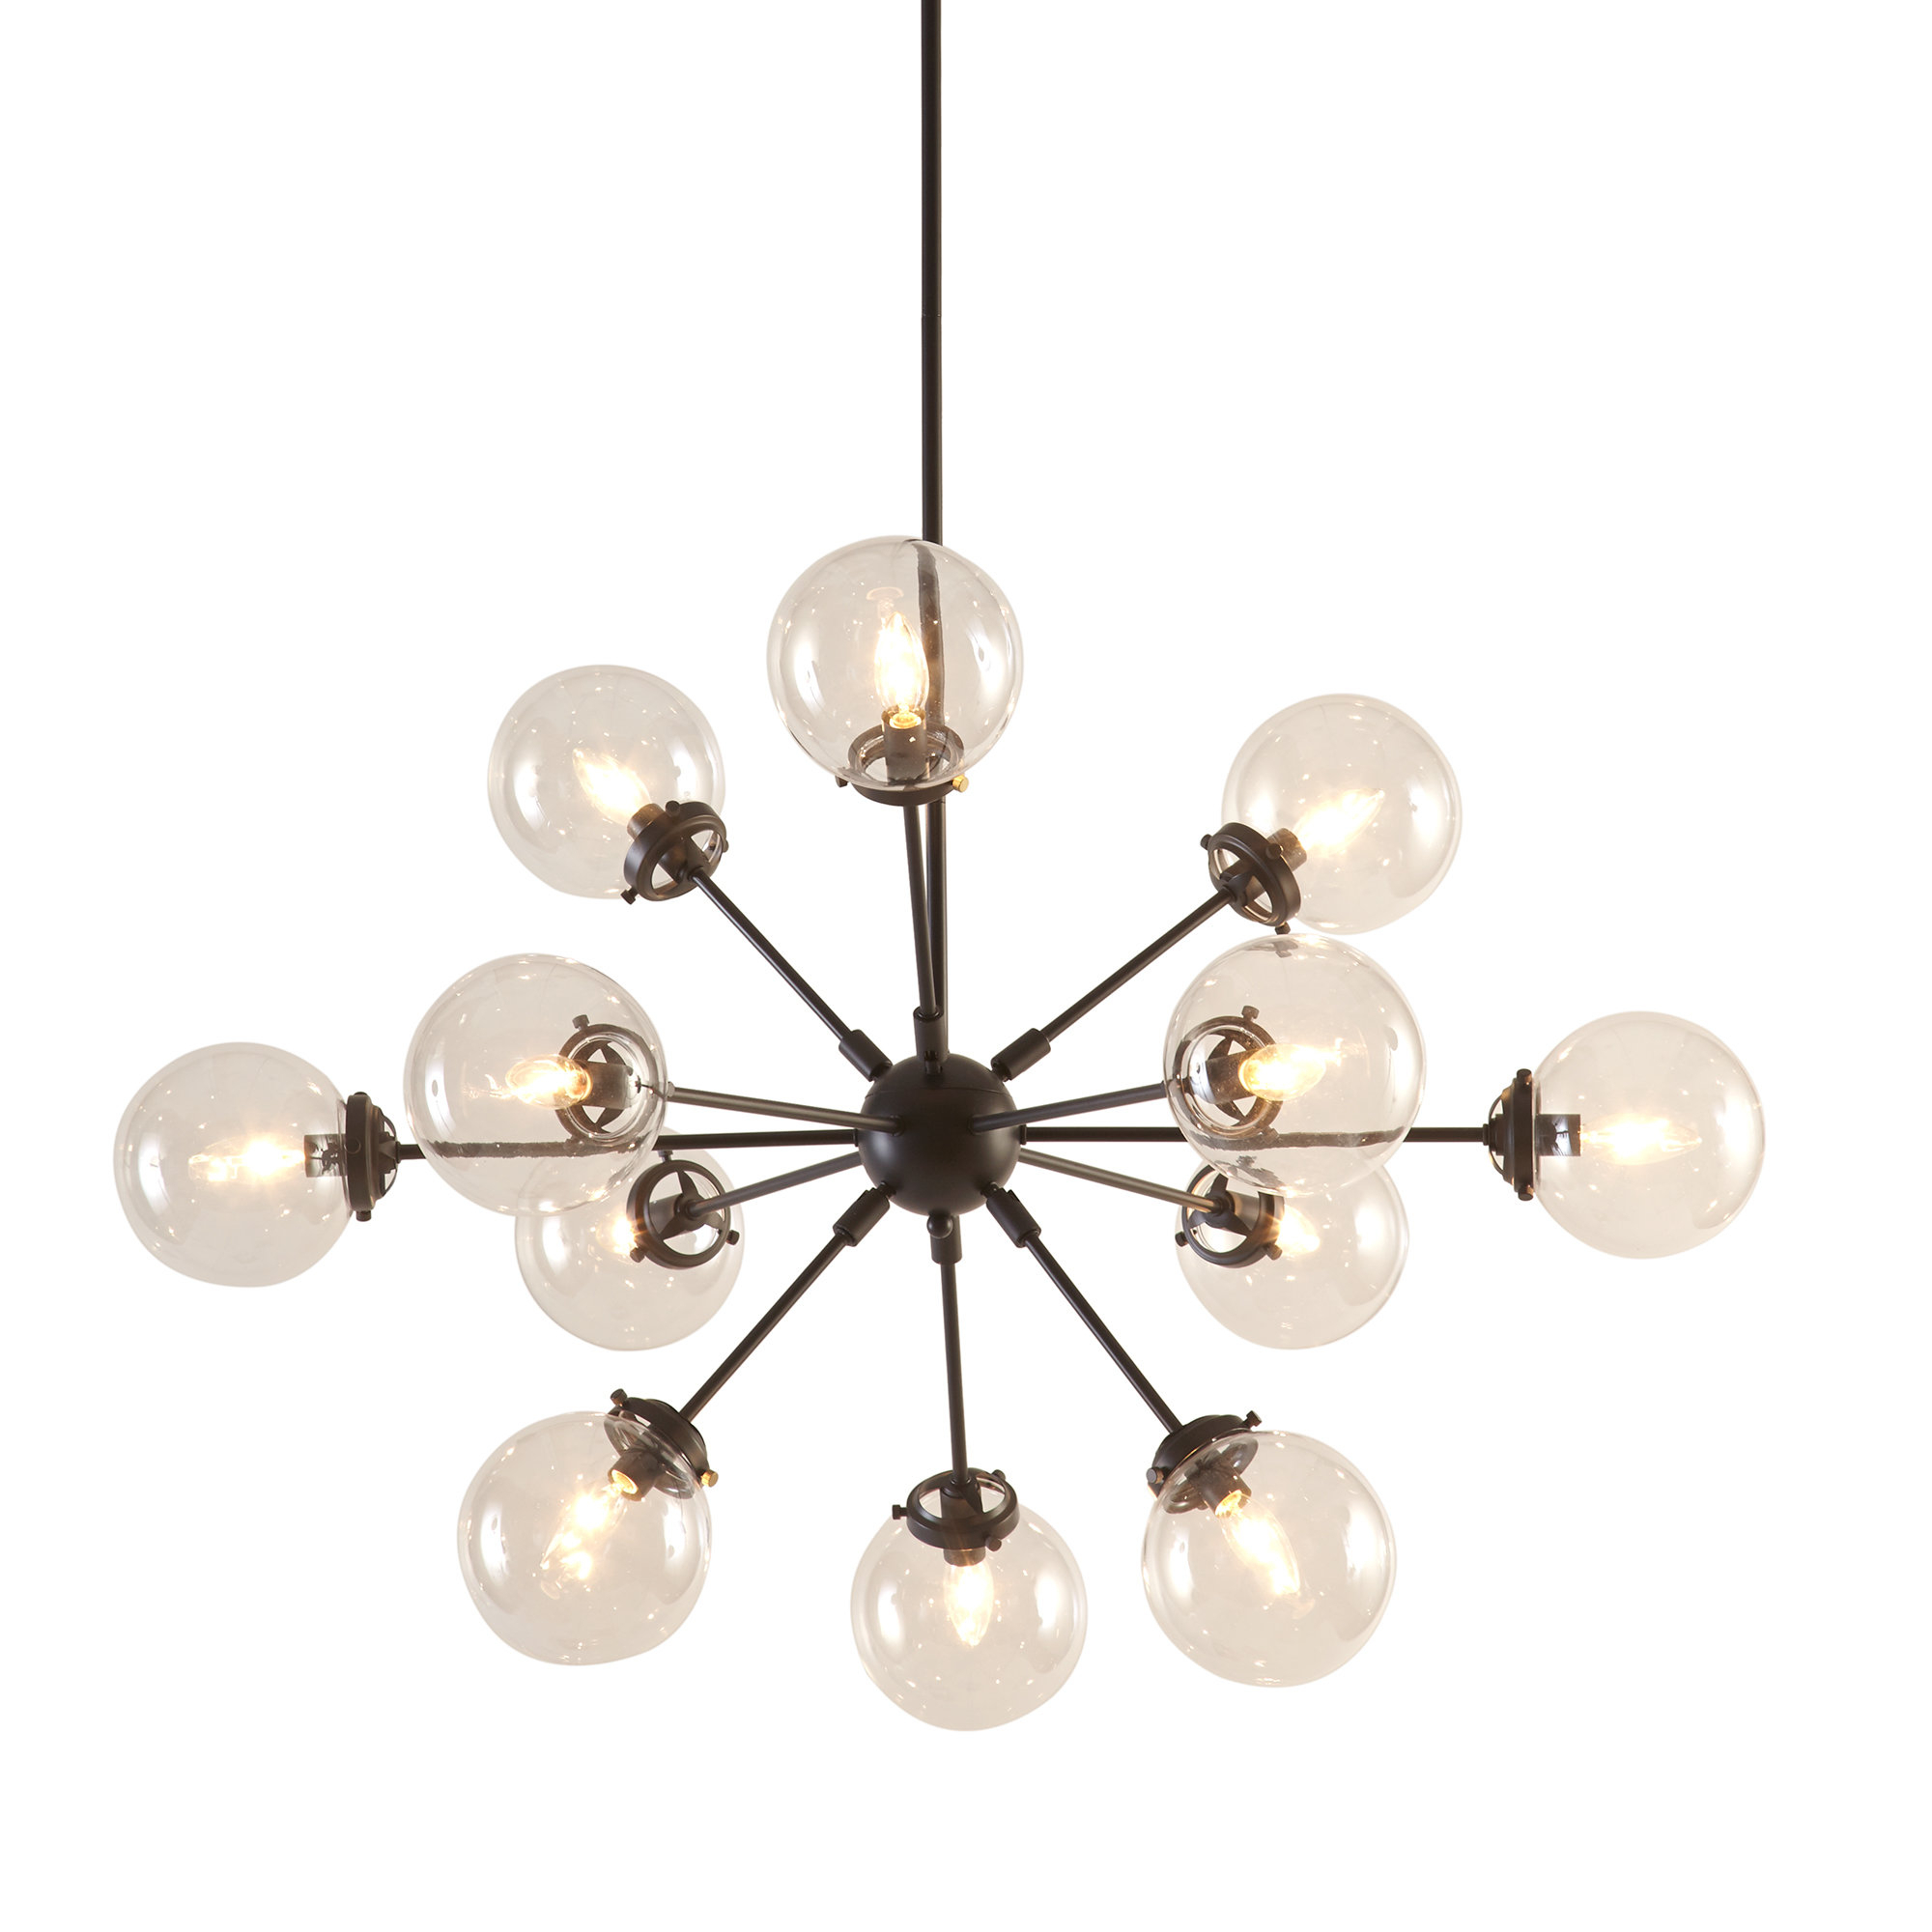 Asher 12 Light Sputnik Chandeliers Regarding Famous Modern Rustic Interiors Asher 12 Light Sputnik Chandelier (View 4 of 25)